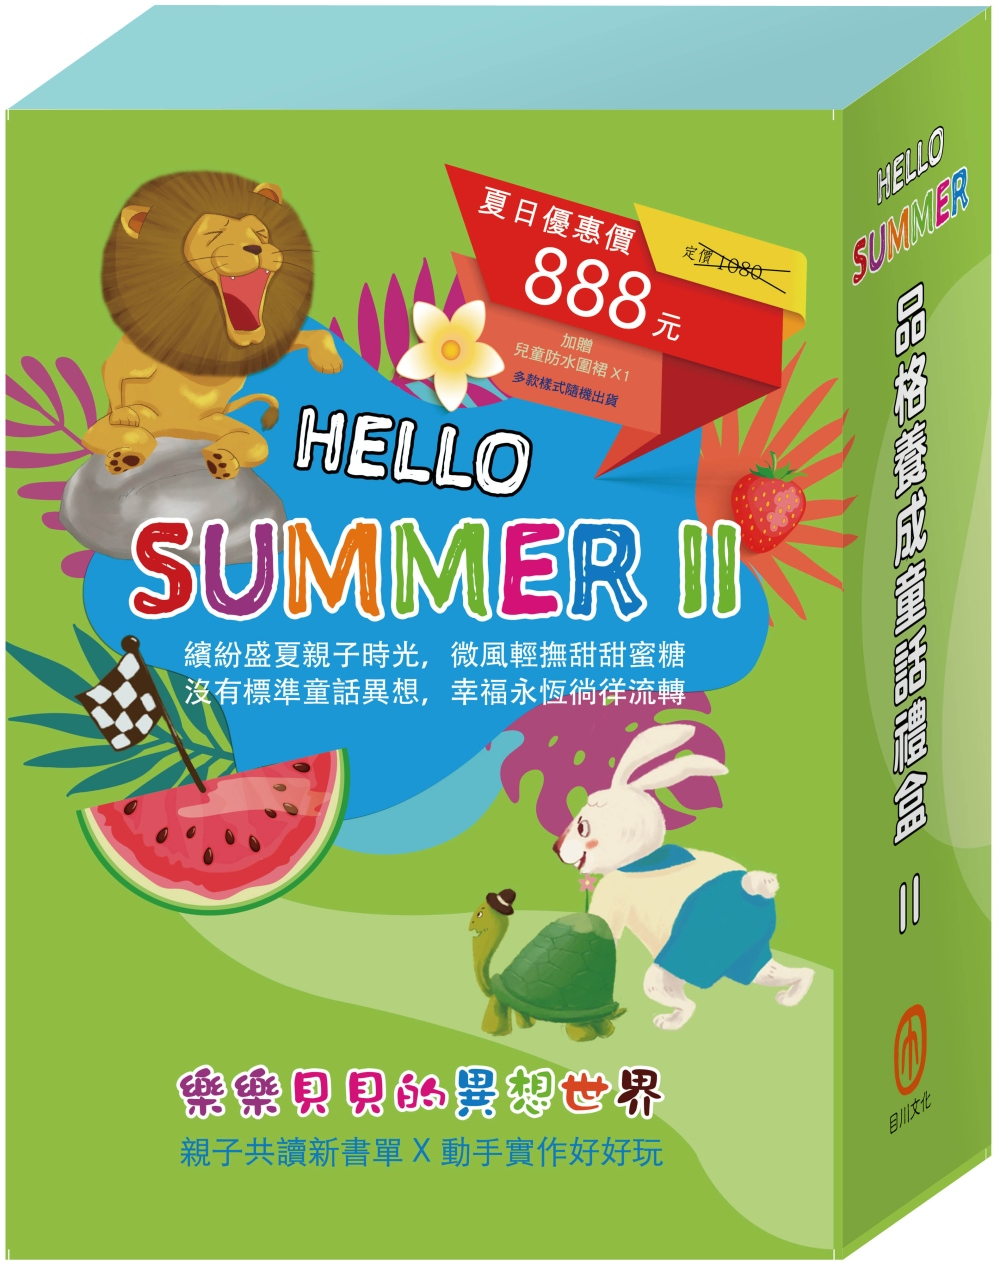 【HELLO SUMMER】品...